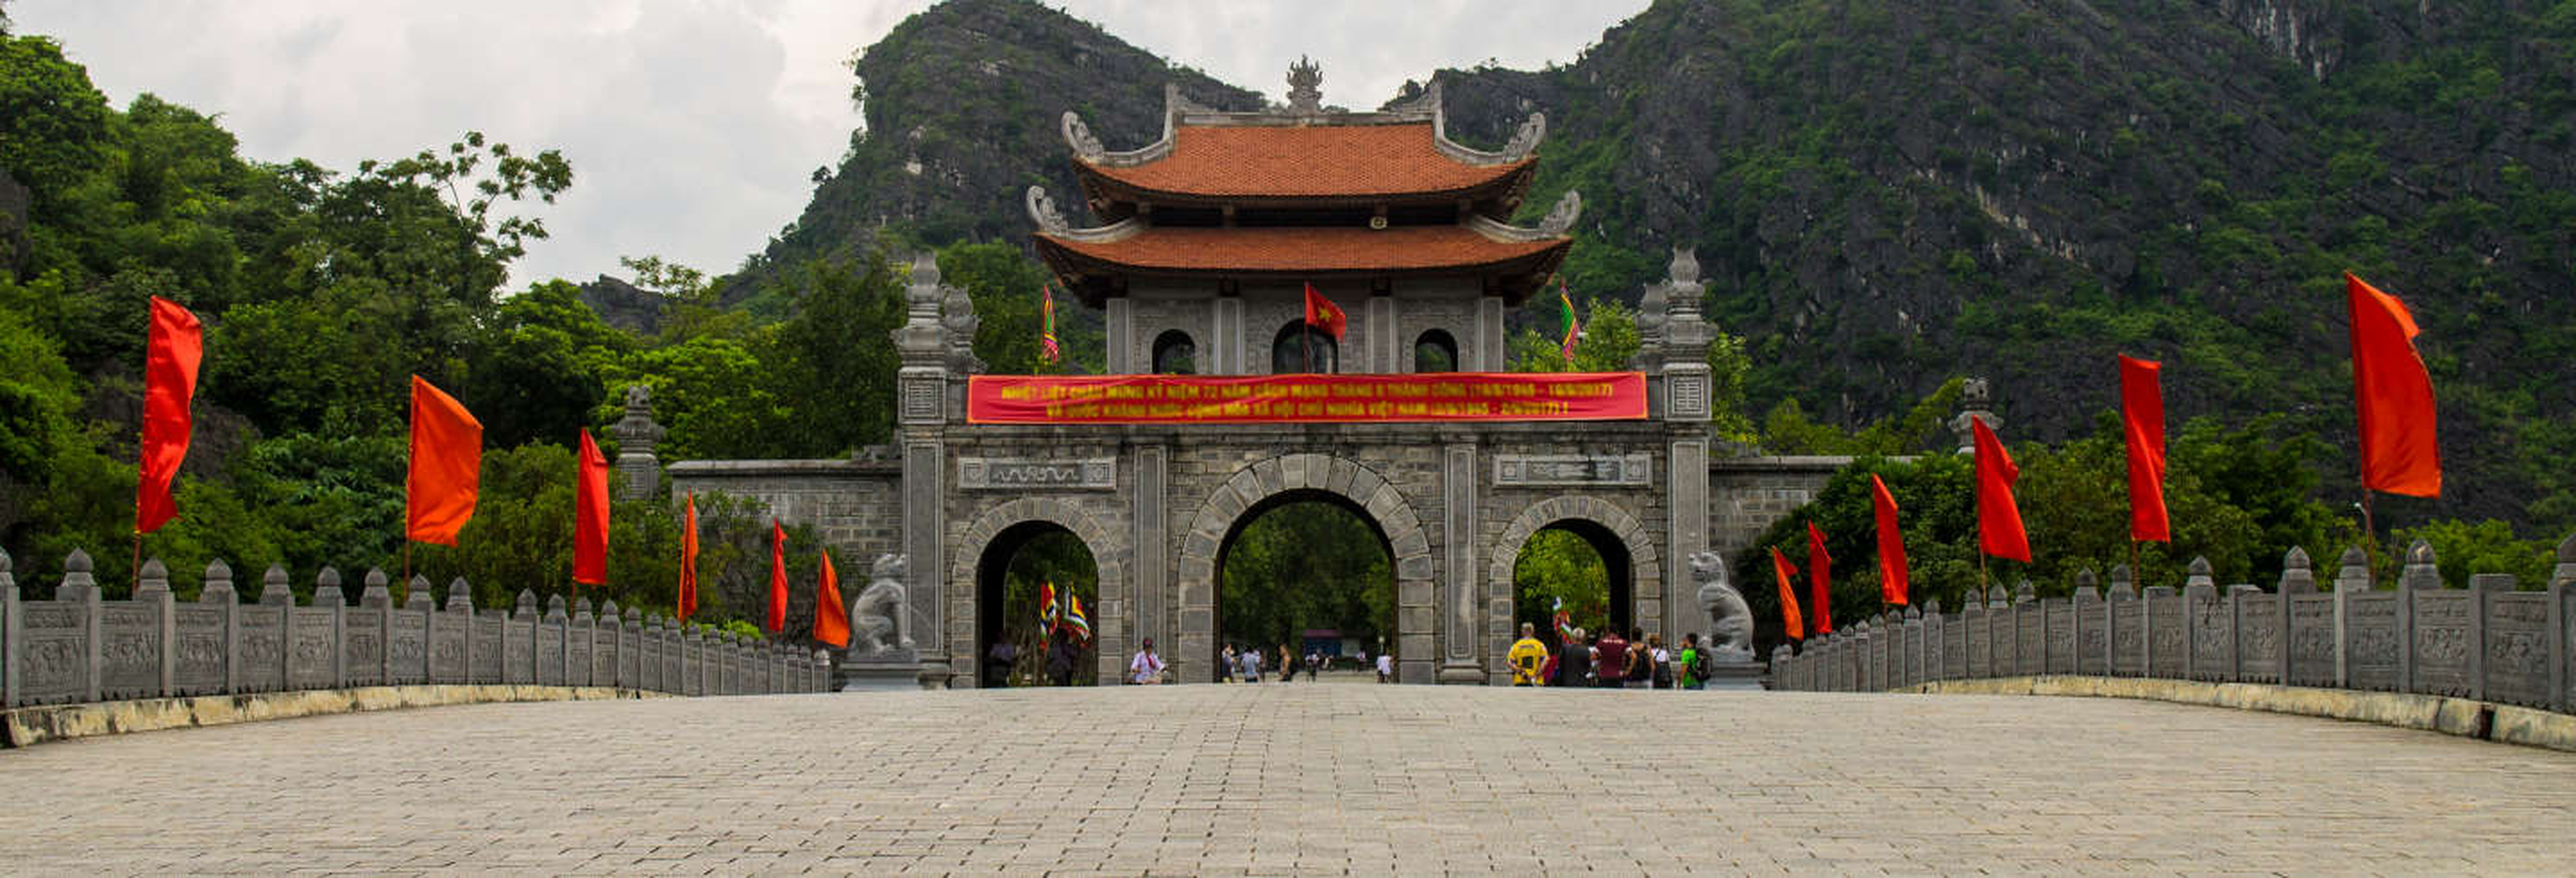 Excursión a Hoa Lu, Mua Cave y Reserva Natural de Van Long